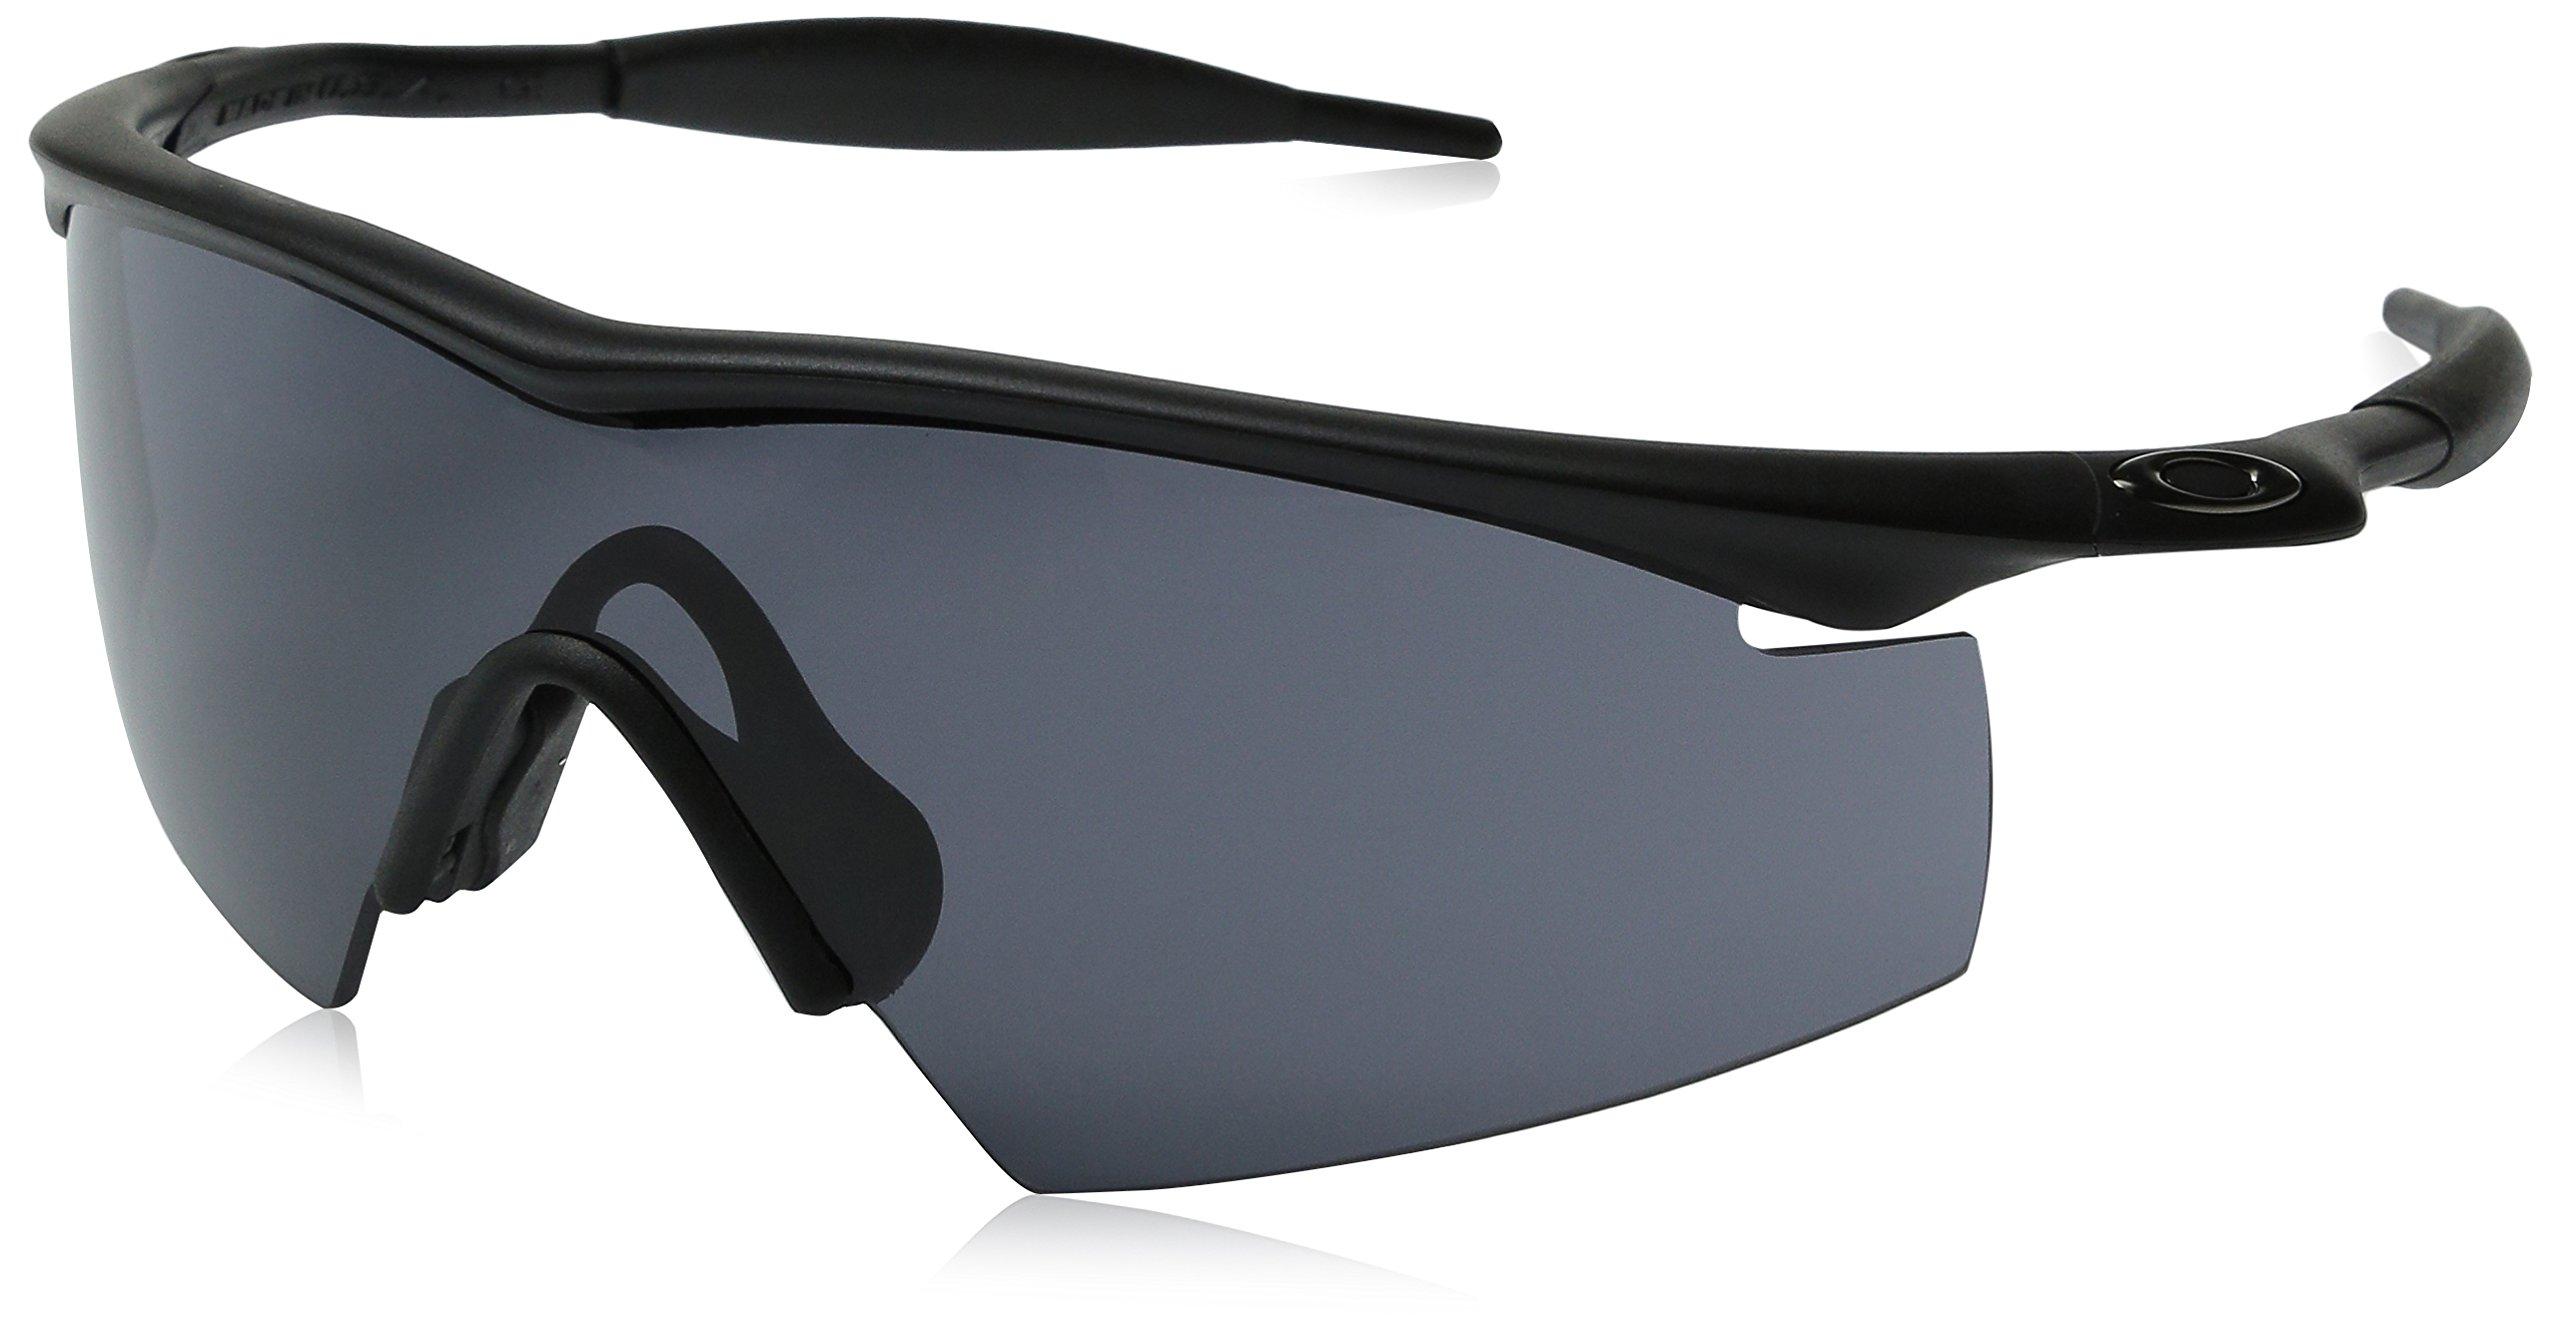 Oakley OO9060 - 11 Sunglasses 34mm